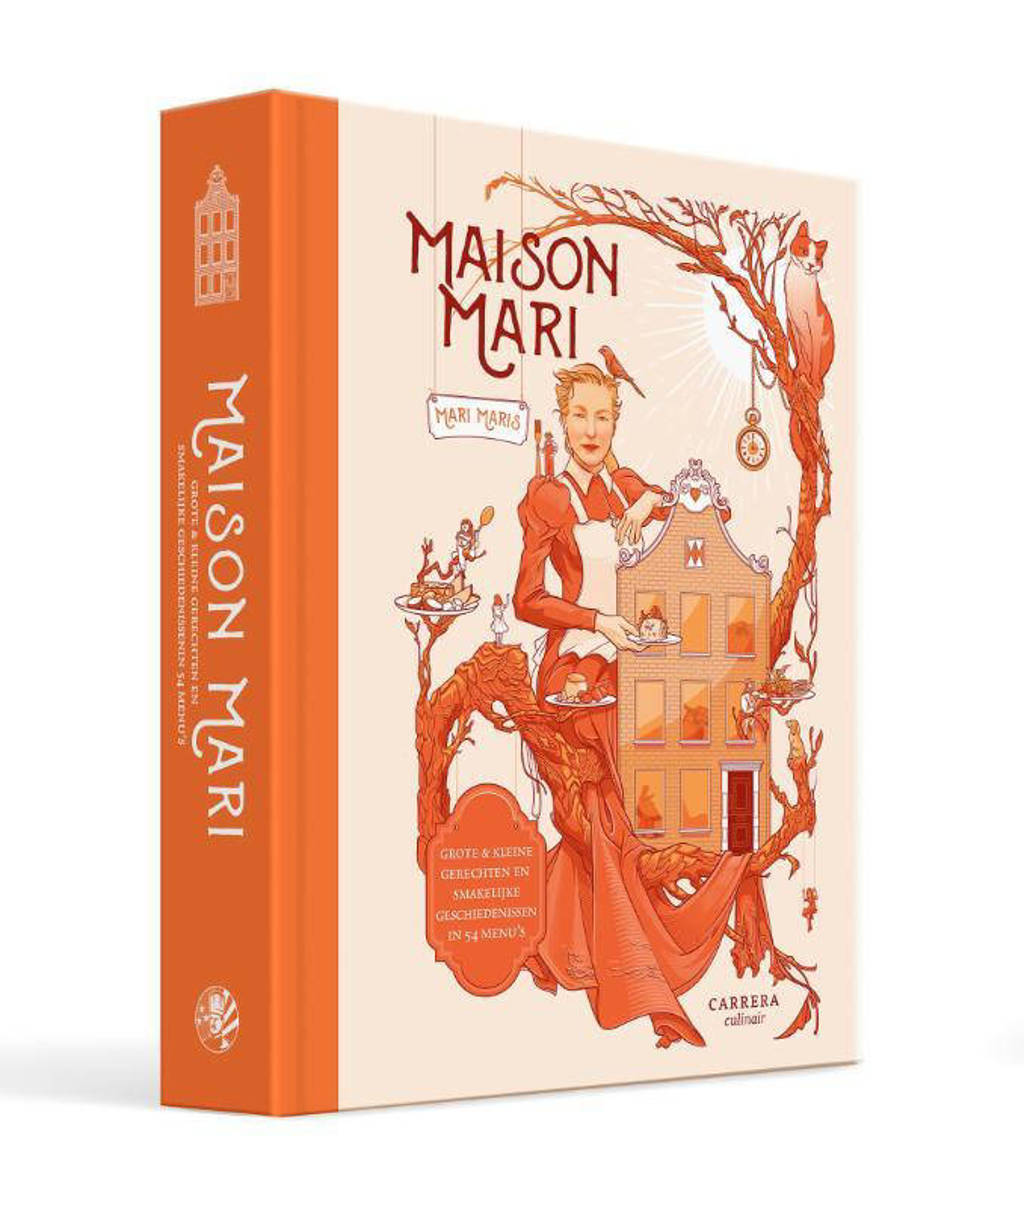 Maison Mari - Mari Maris